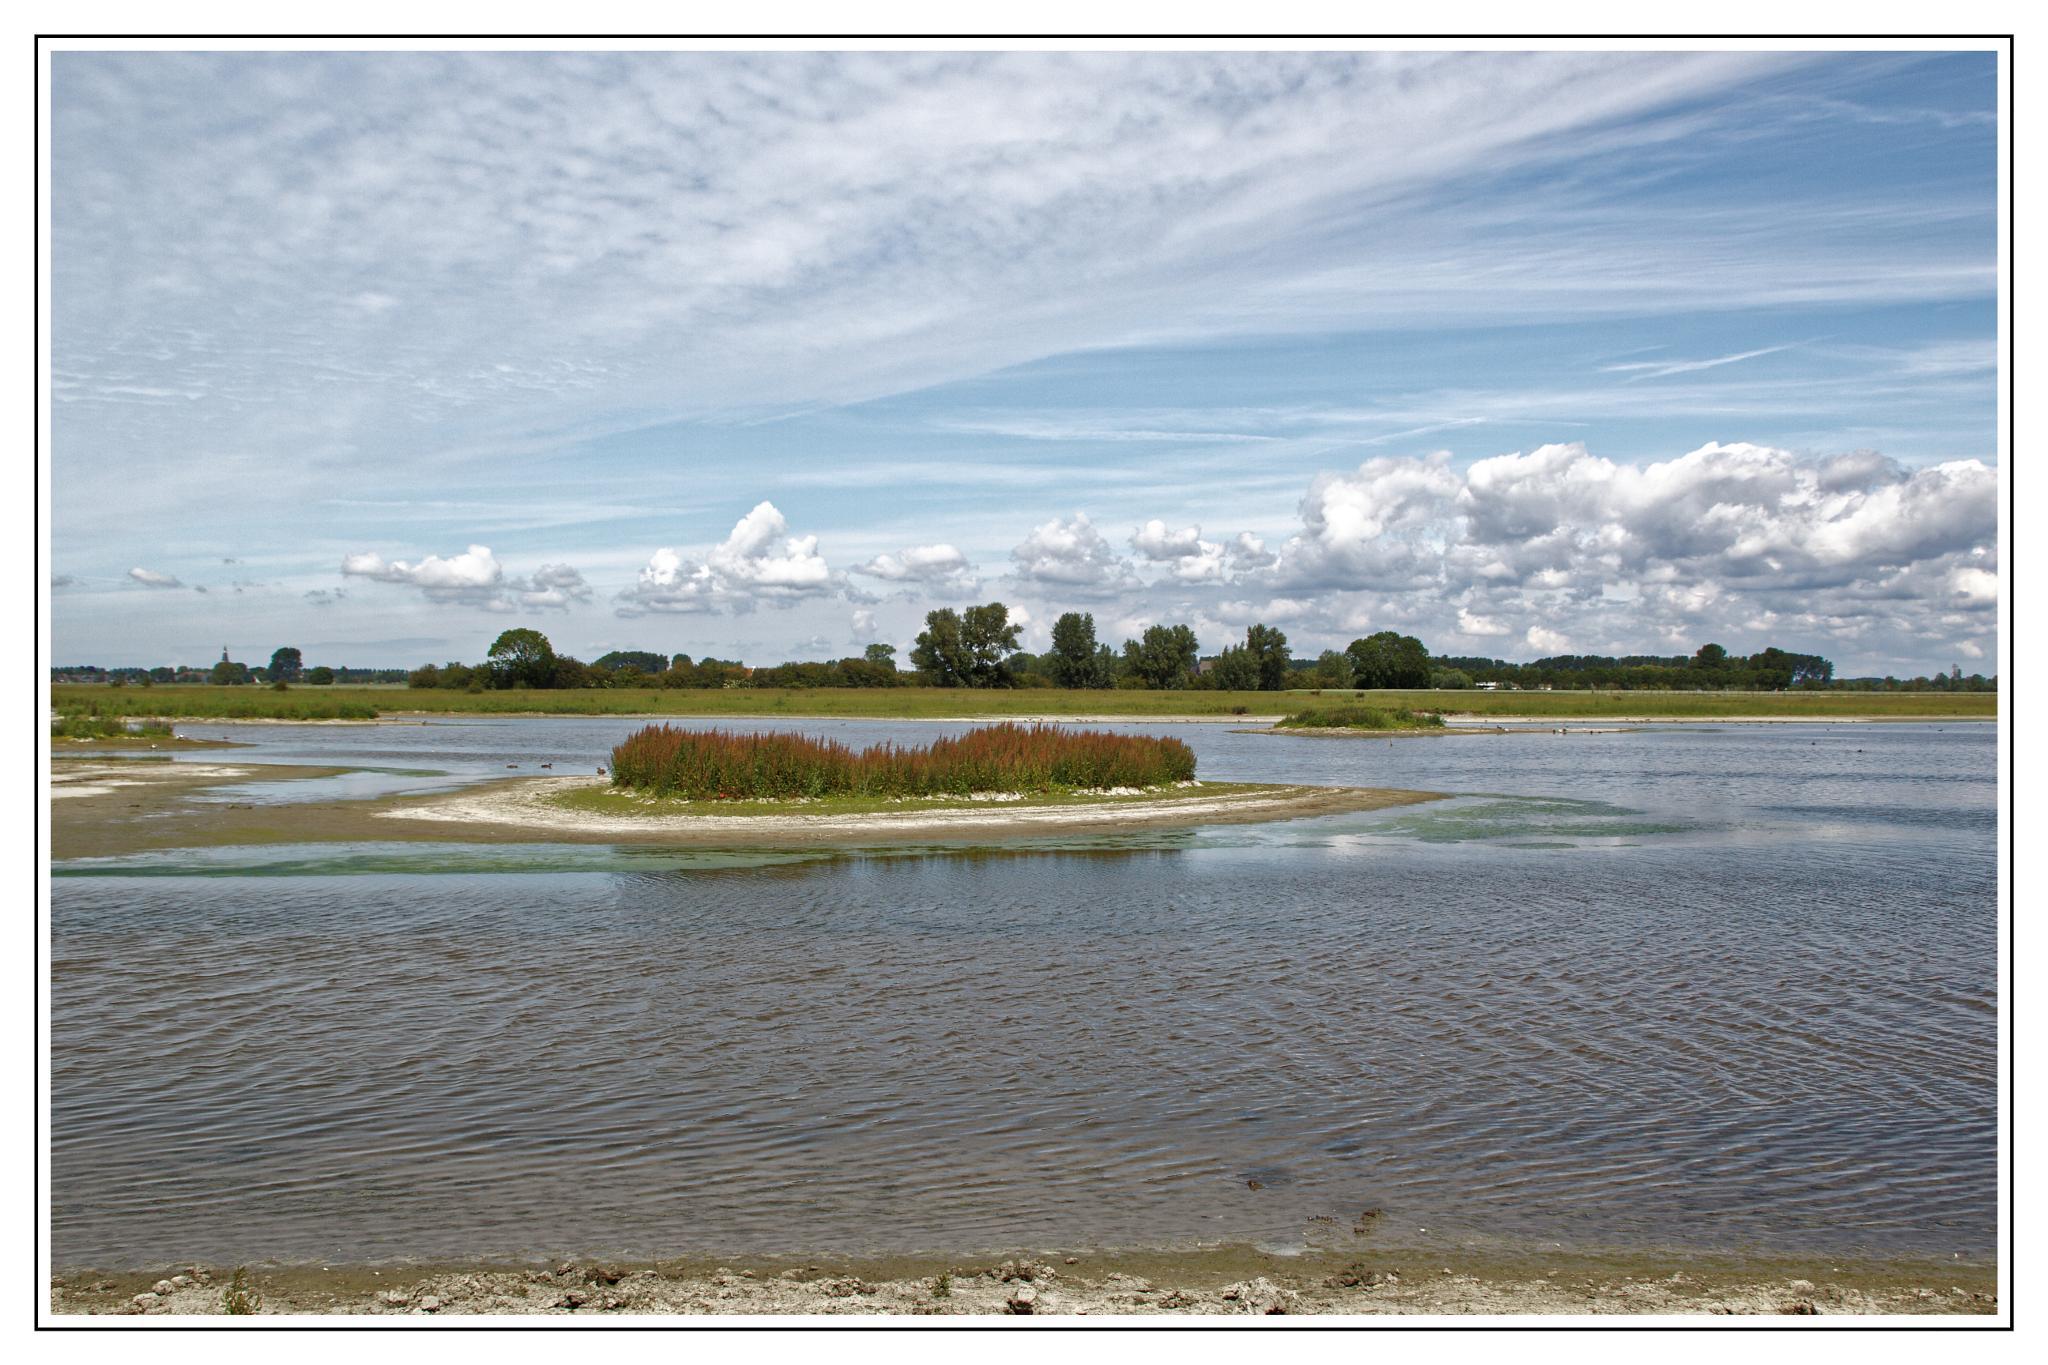 Dutch Clouds 2 by Bram (Pepperfarm Photo-Works)